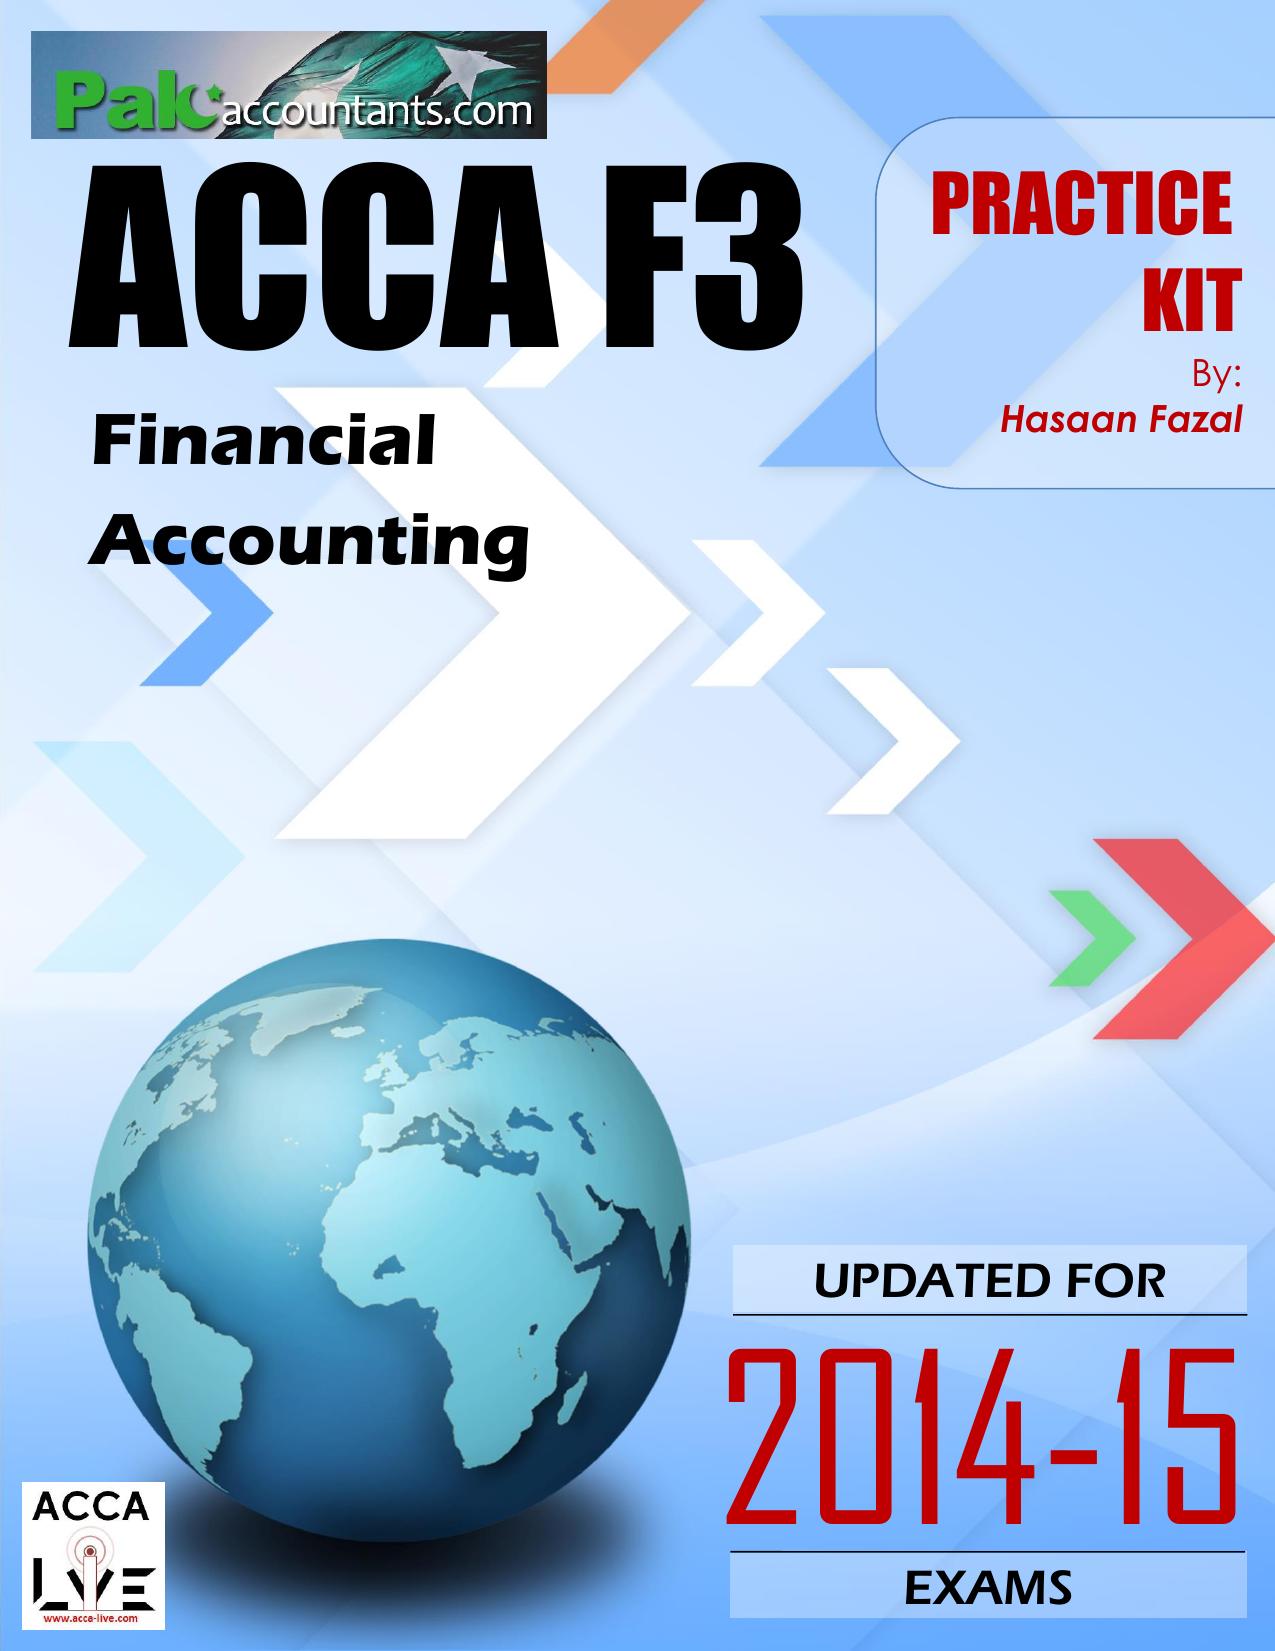 59773432-ACCA-F3-Practice-Kit-PakAccountants